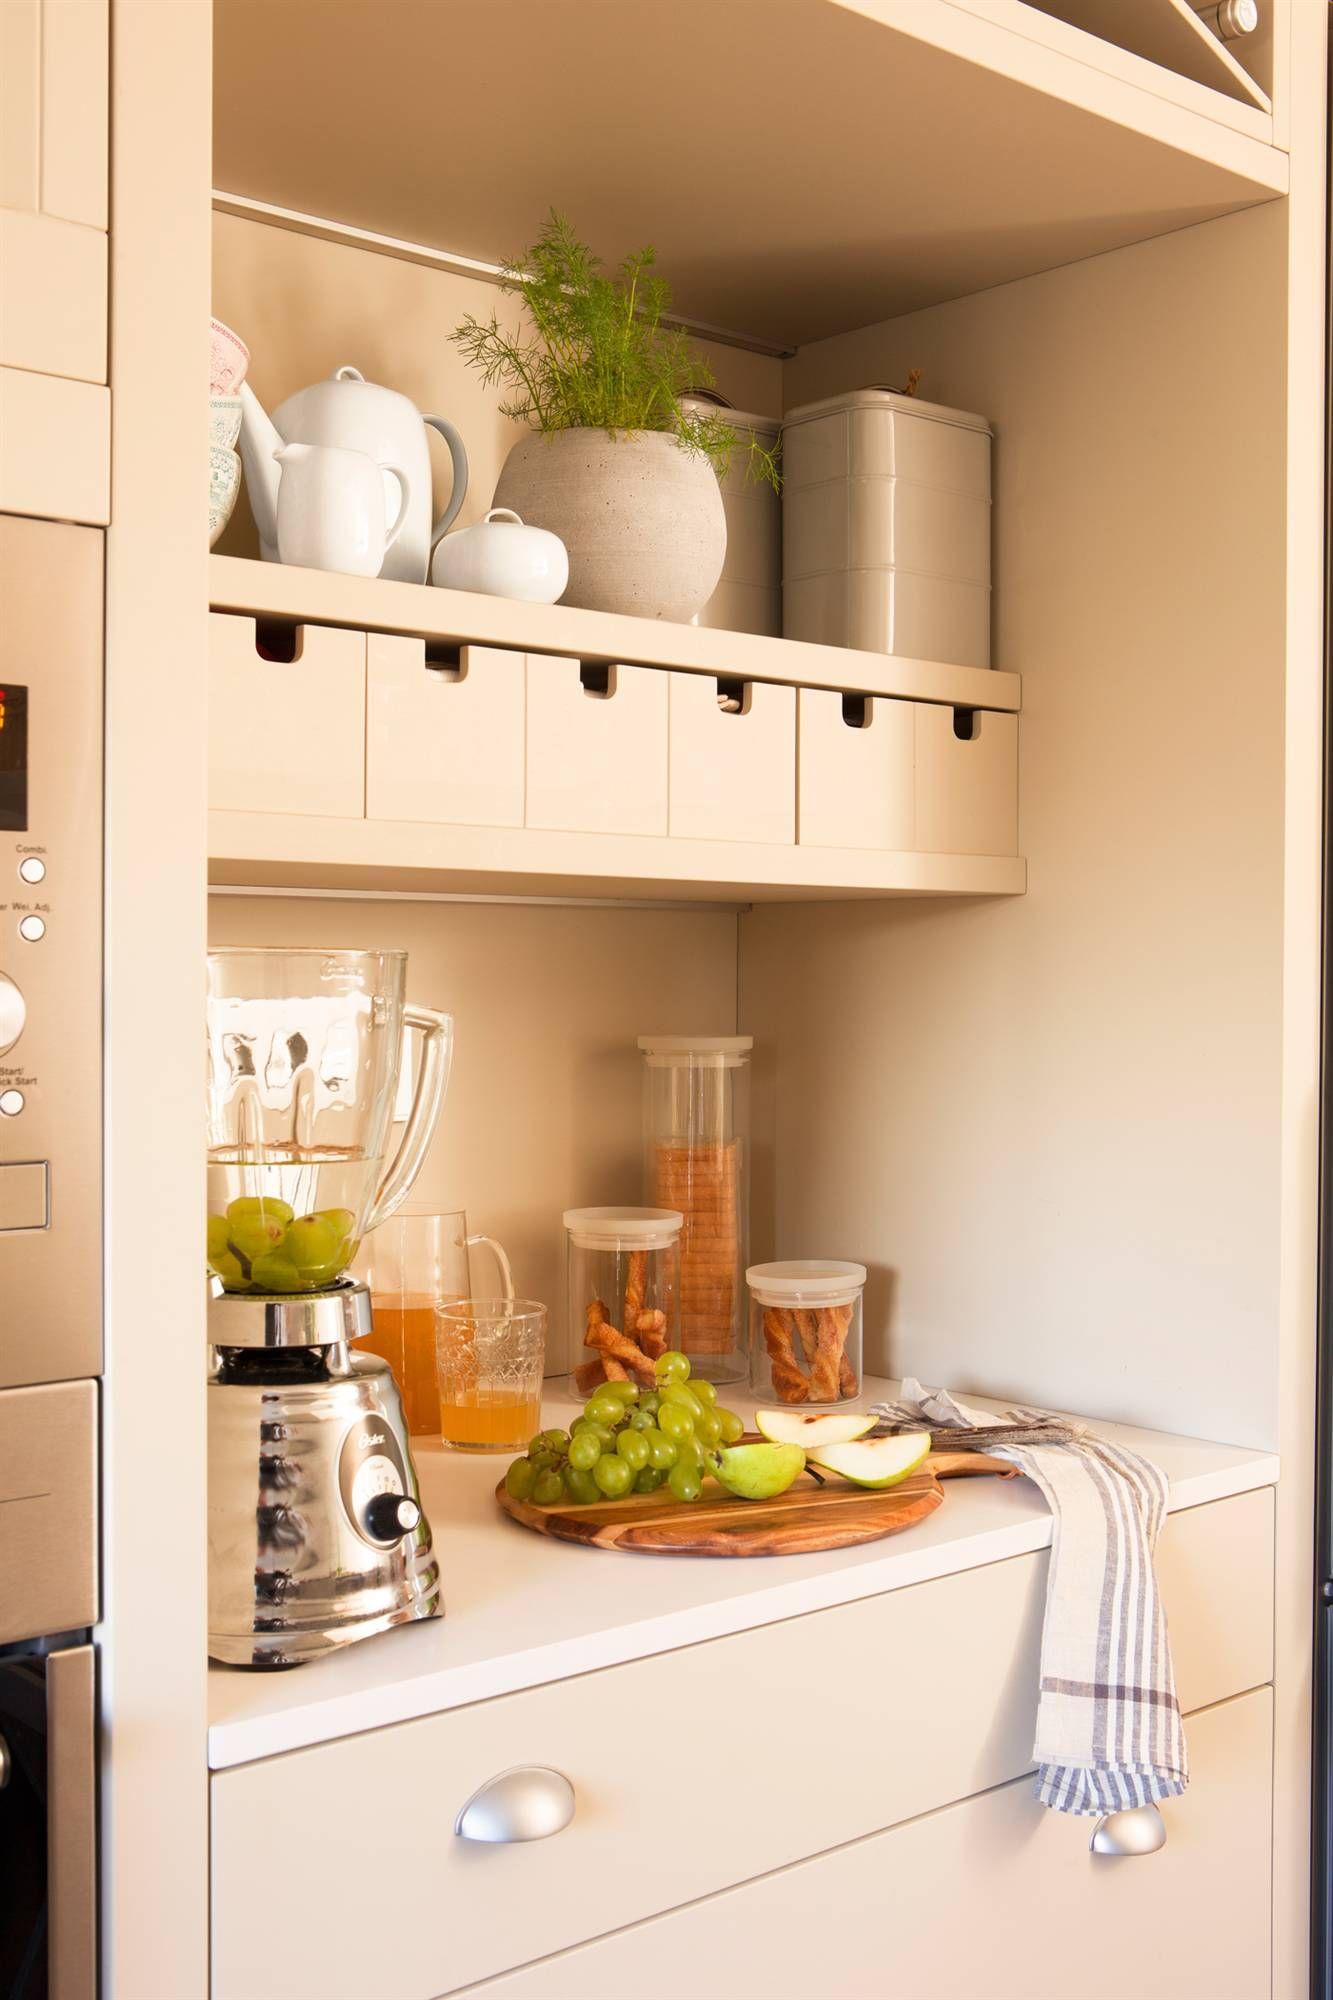 Zona de desayuno con peque os electrodom sticos botes de - Estantes de cocina ...